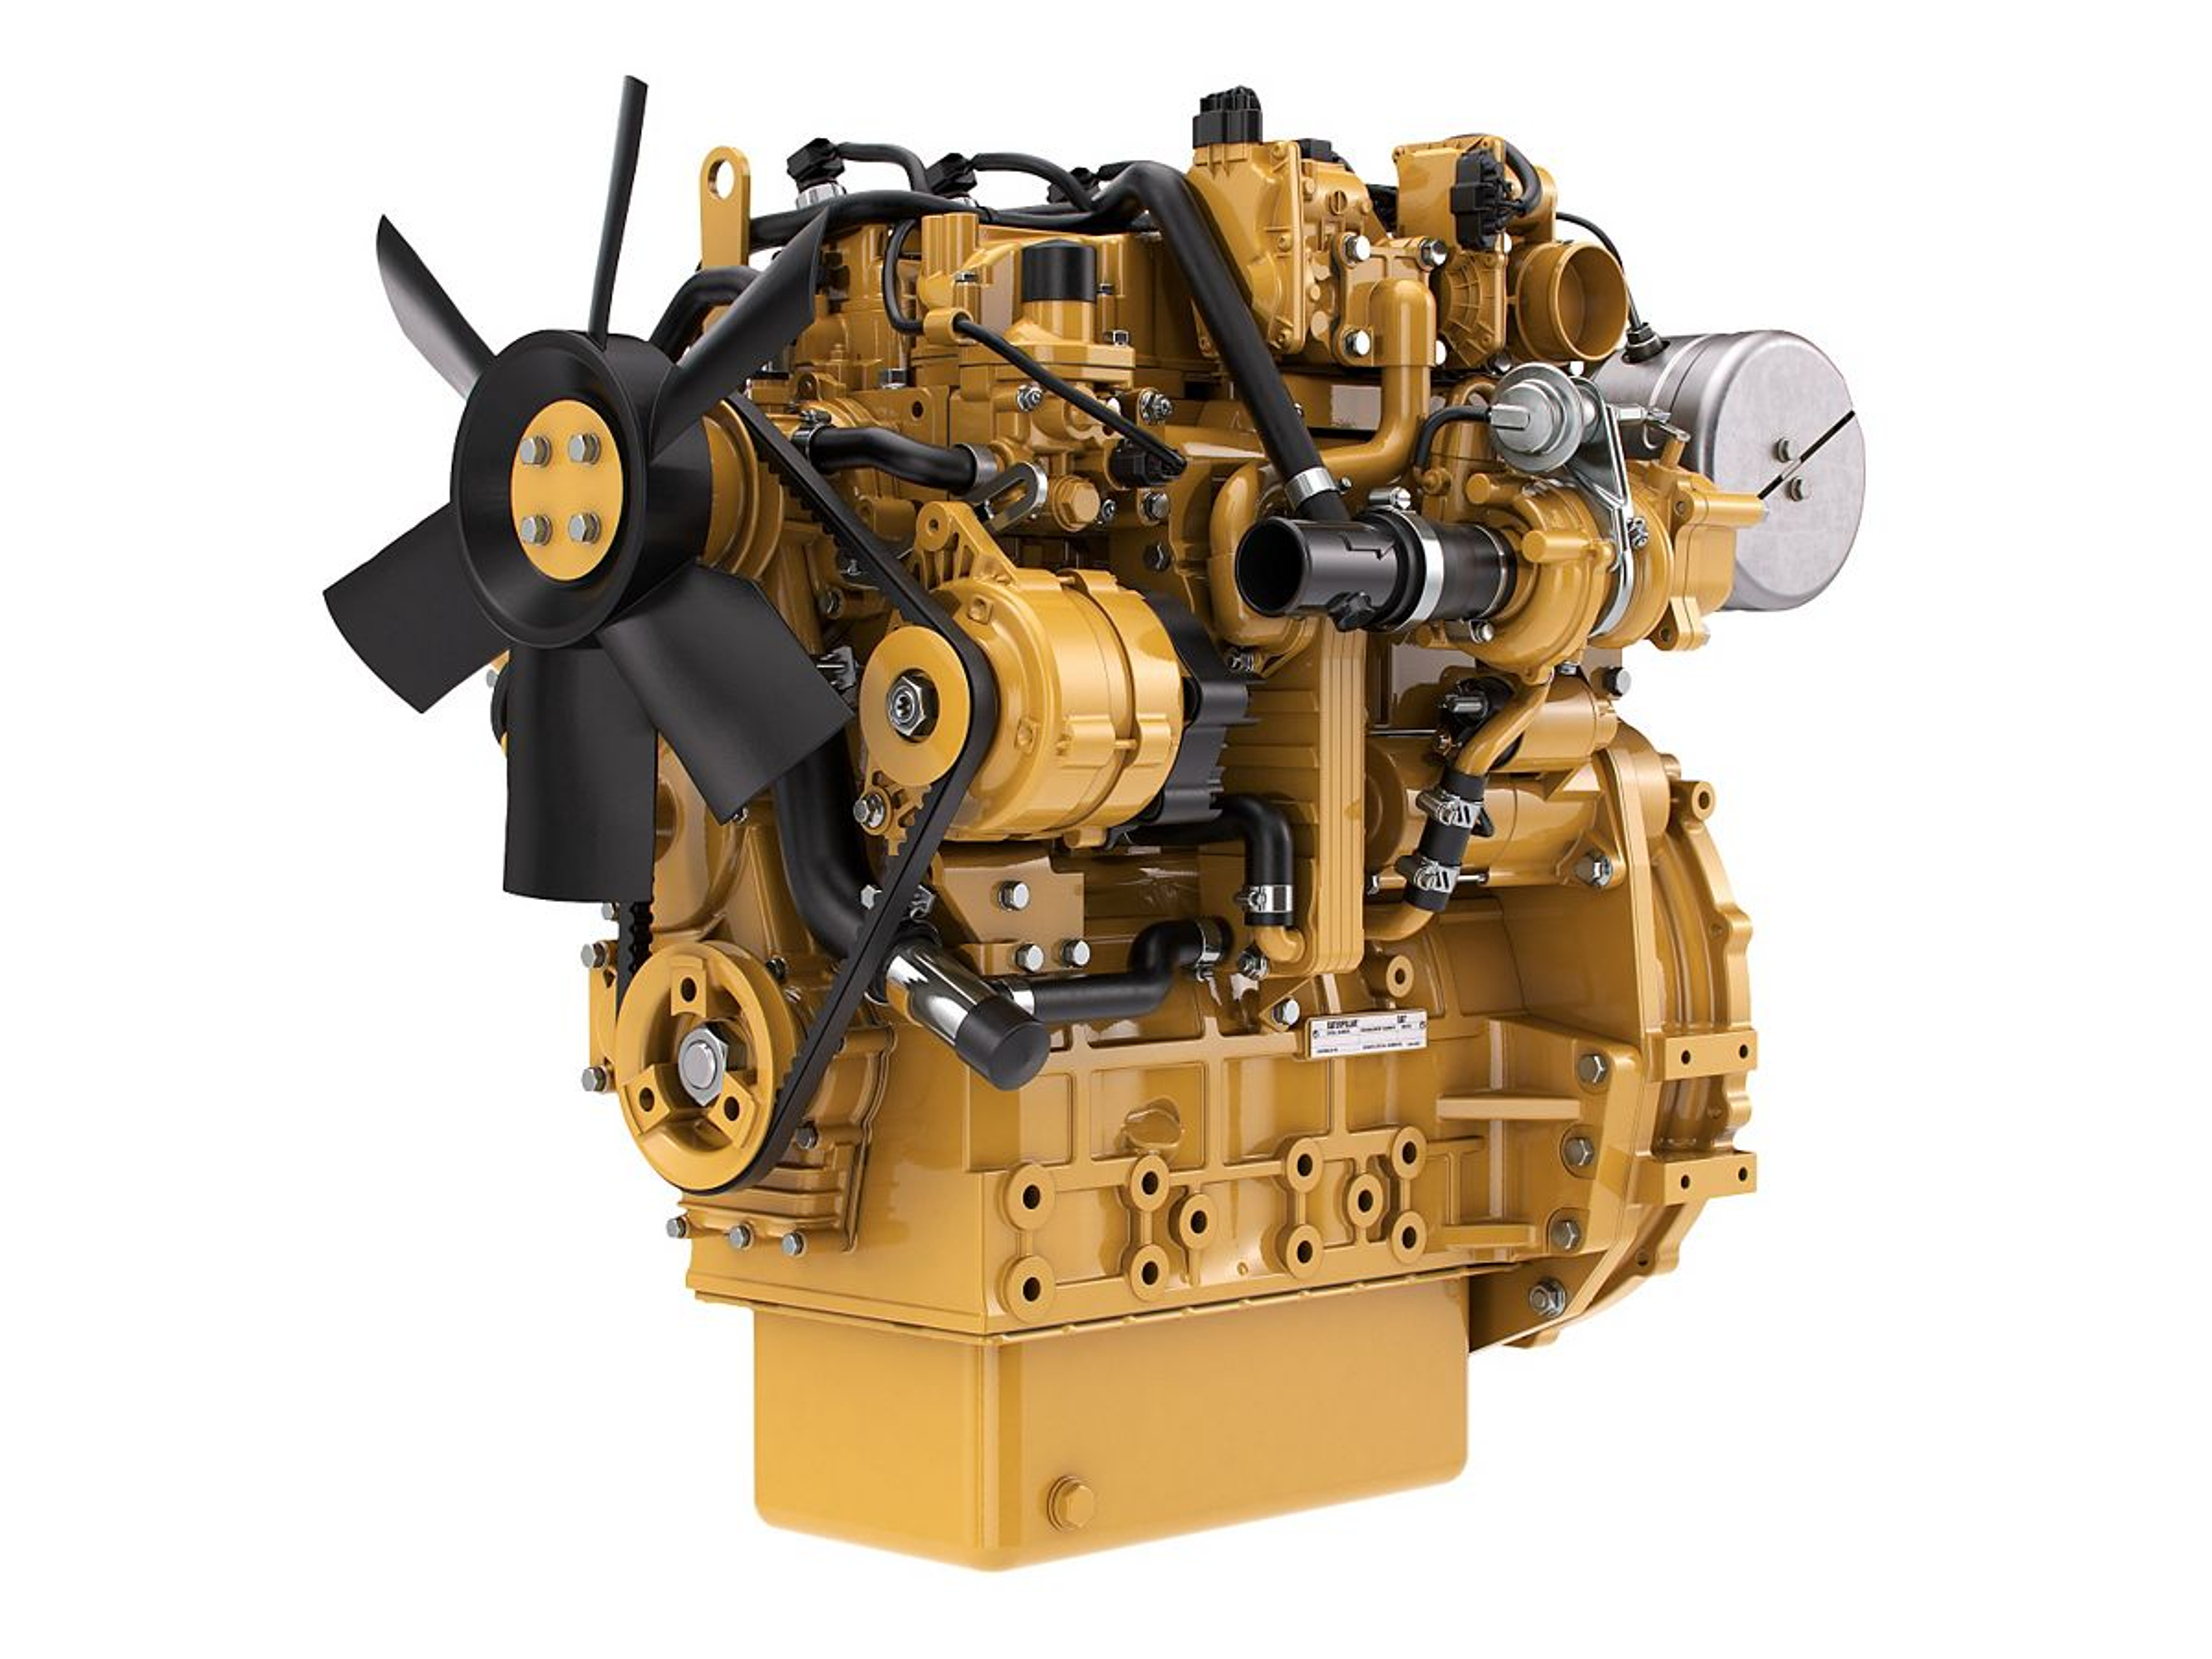 C2.2 Tier 4 Diesel Engines – Highly Regulated